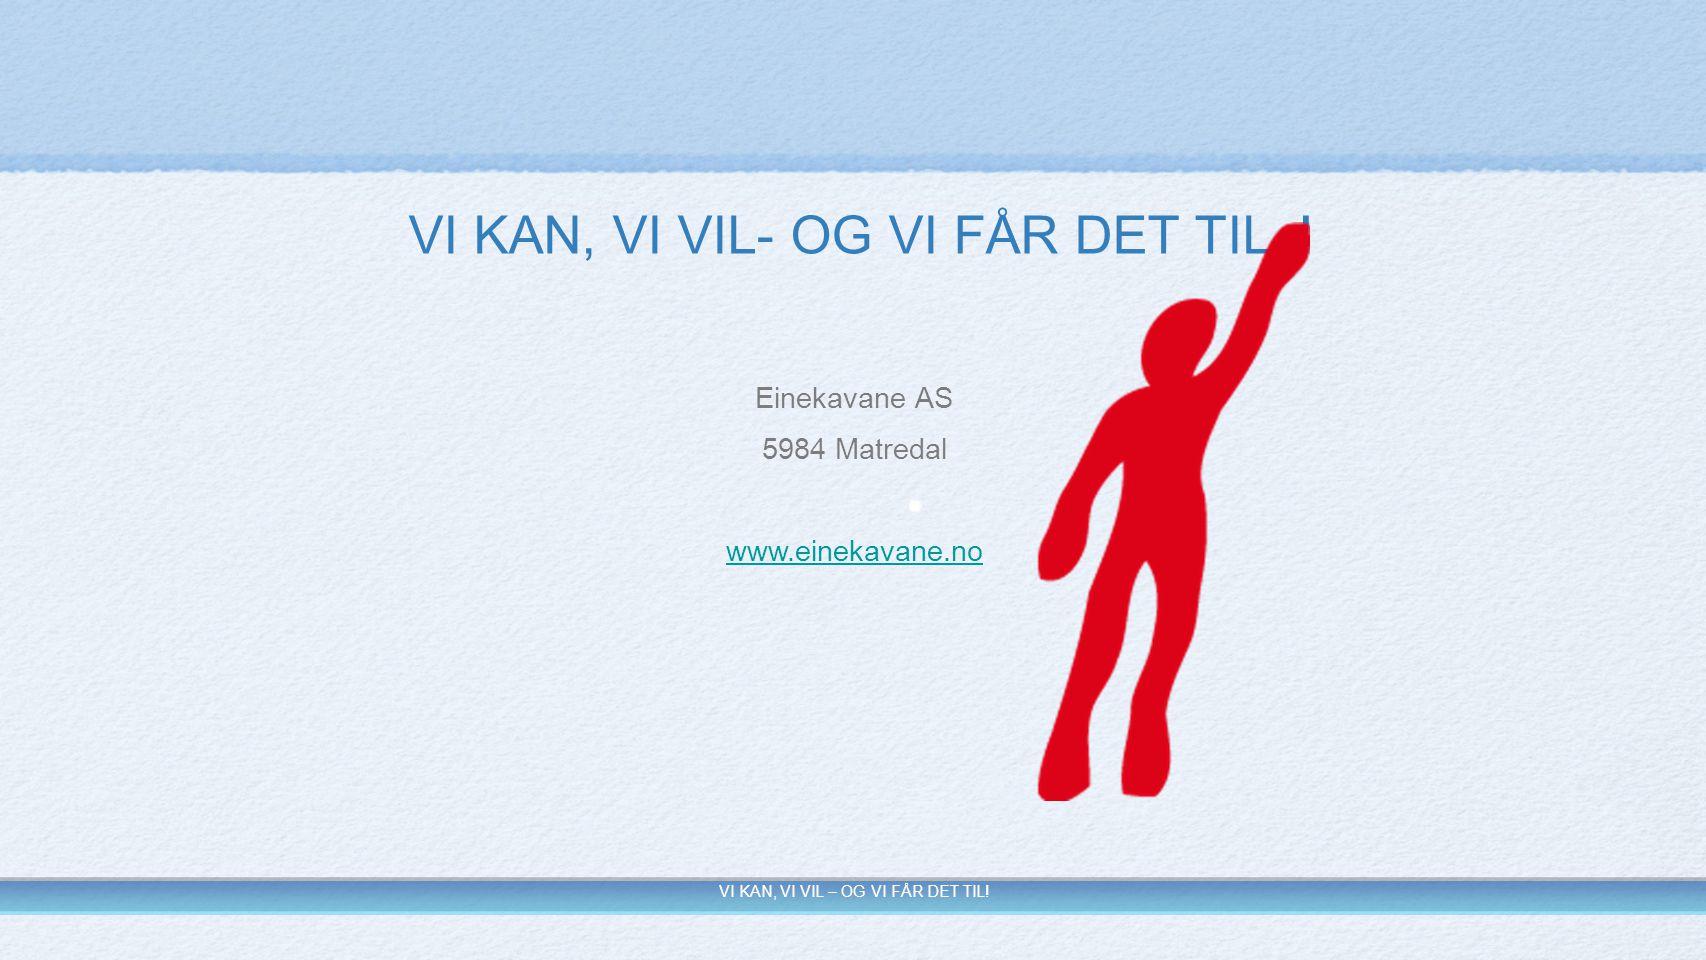 Einekavane AS 5984 Matredal www.einekavane.no VI KAN, VI VIL – OG VI FÅR DET TIL! VI KAN, VI VIL- OG VI FÅR DET TIL !